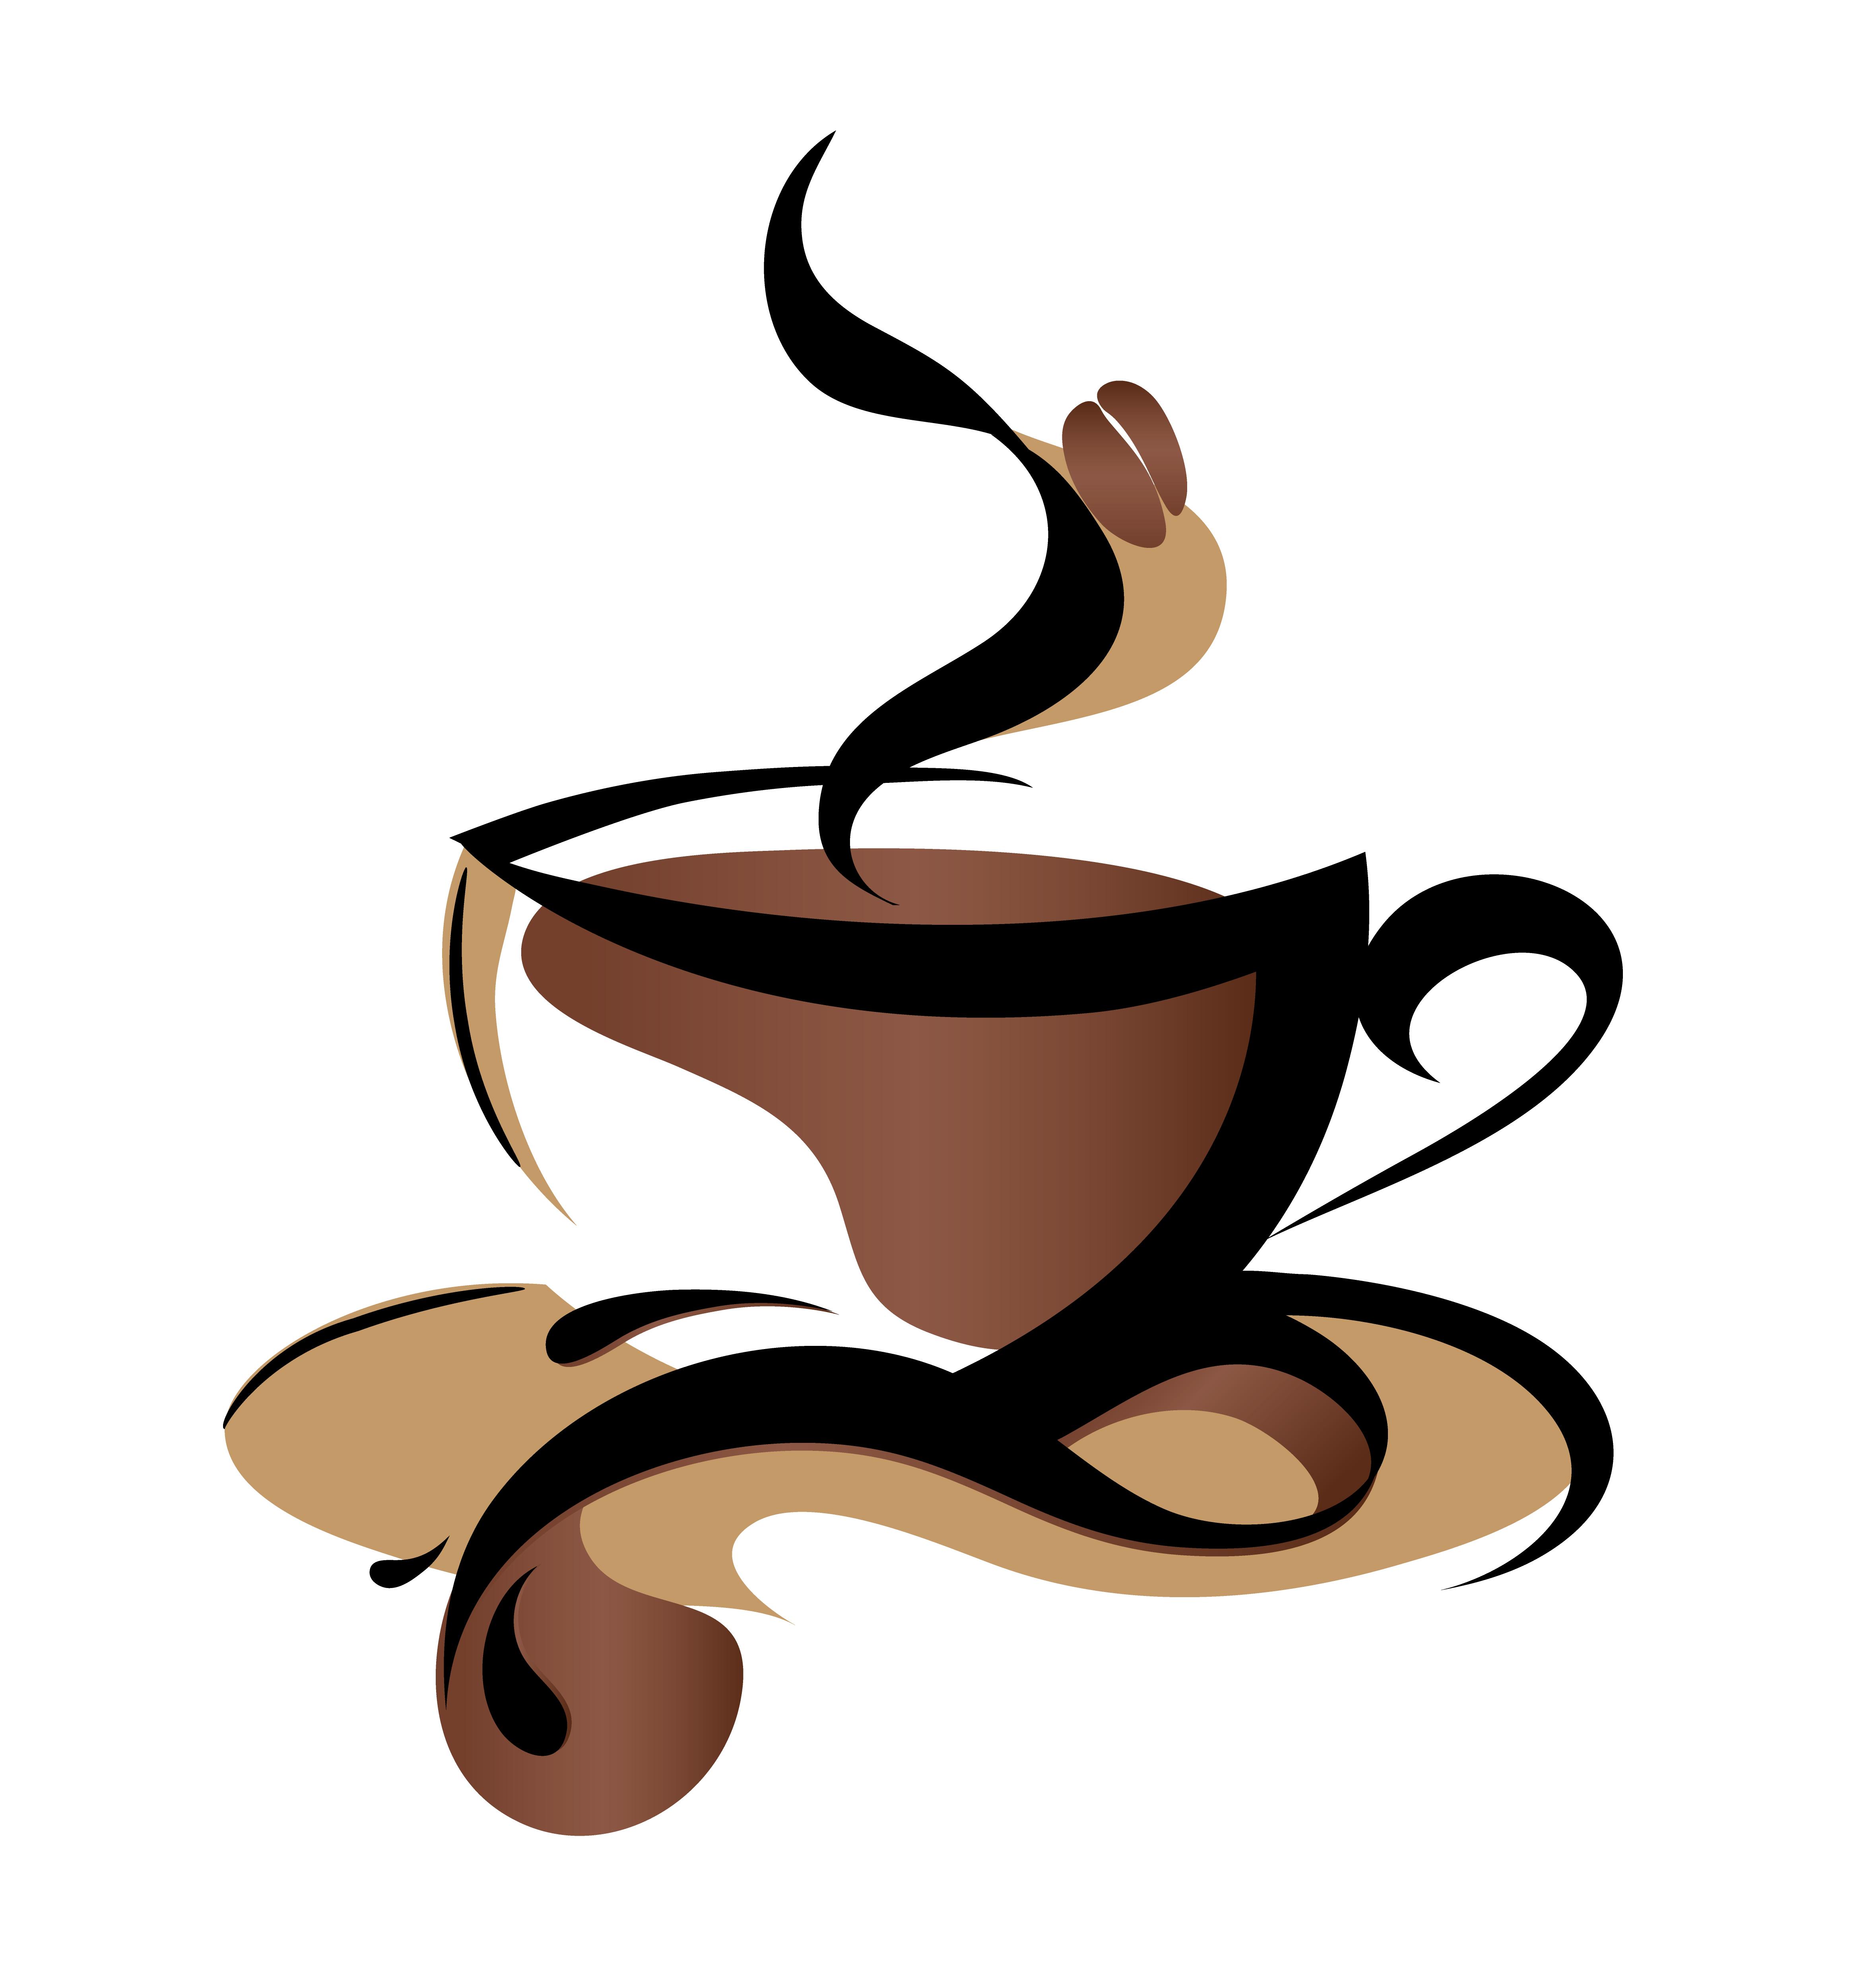 coffee can clip art - photo #6